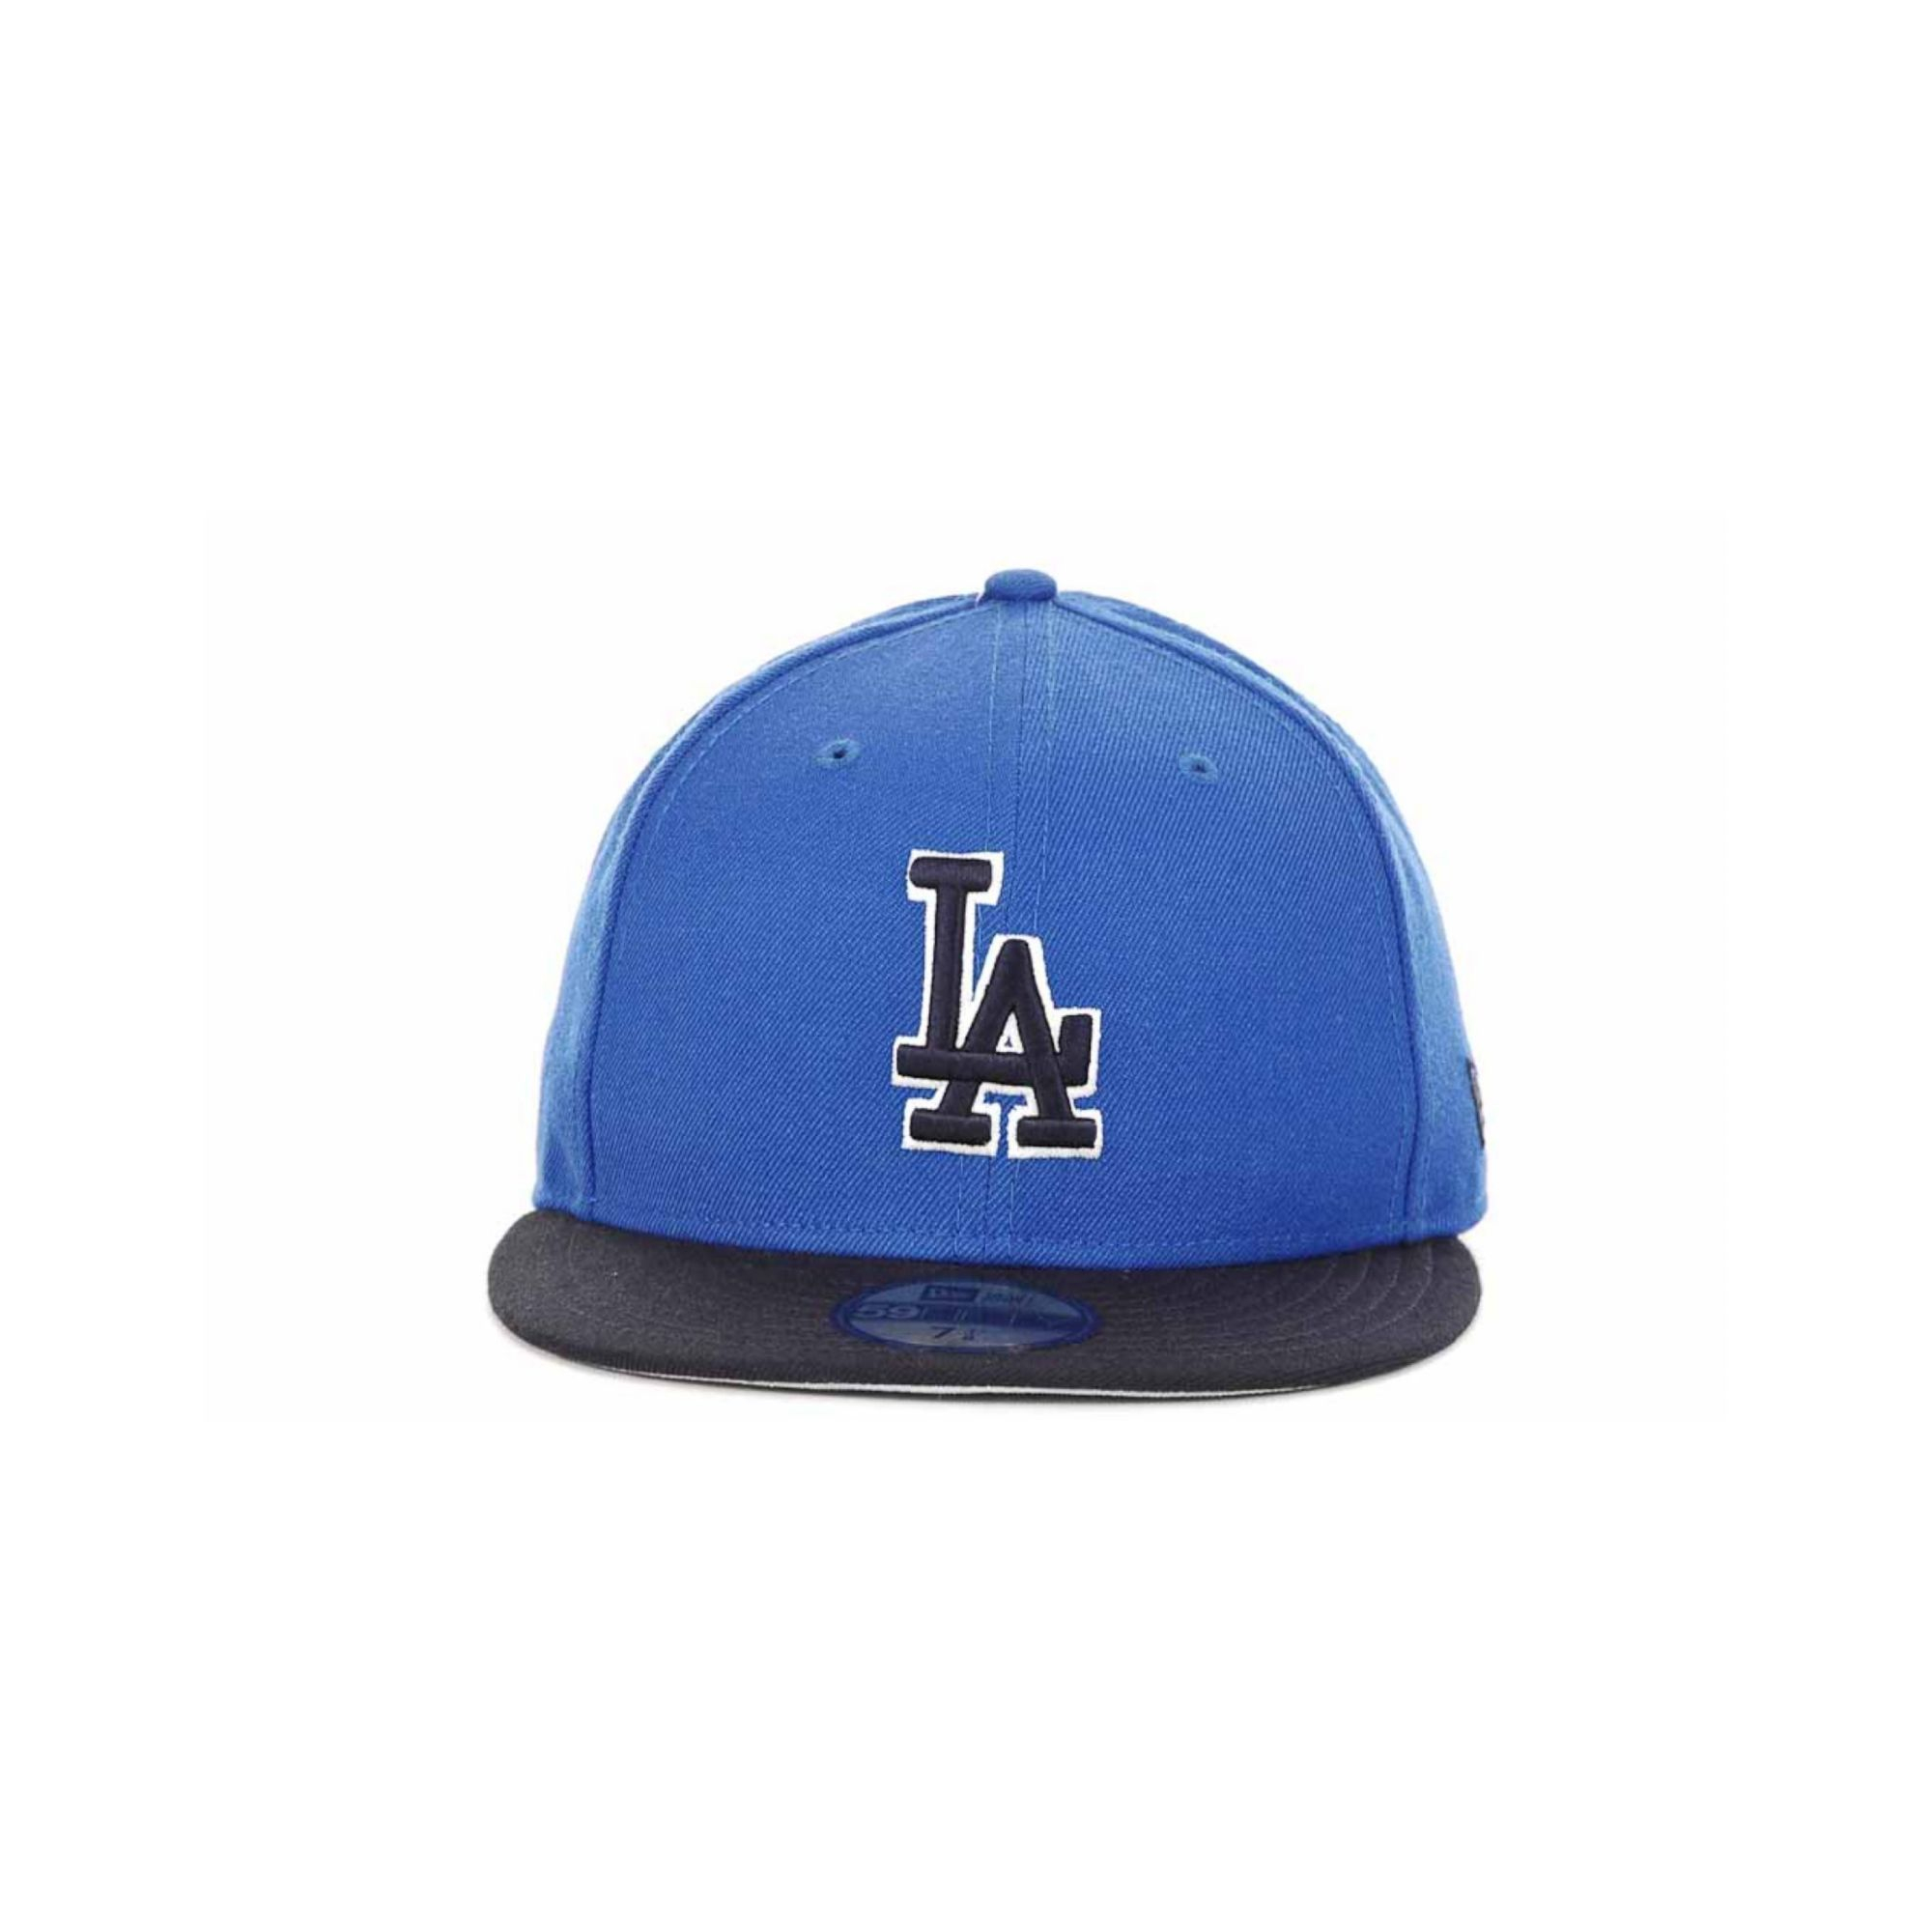 8255f537eed Lyst - Ktz Los Angeles Dodgers Mlb 2t Custom 59fifty Cap in Blue for Men